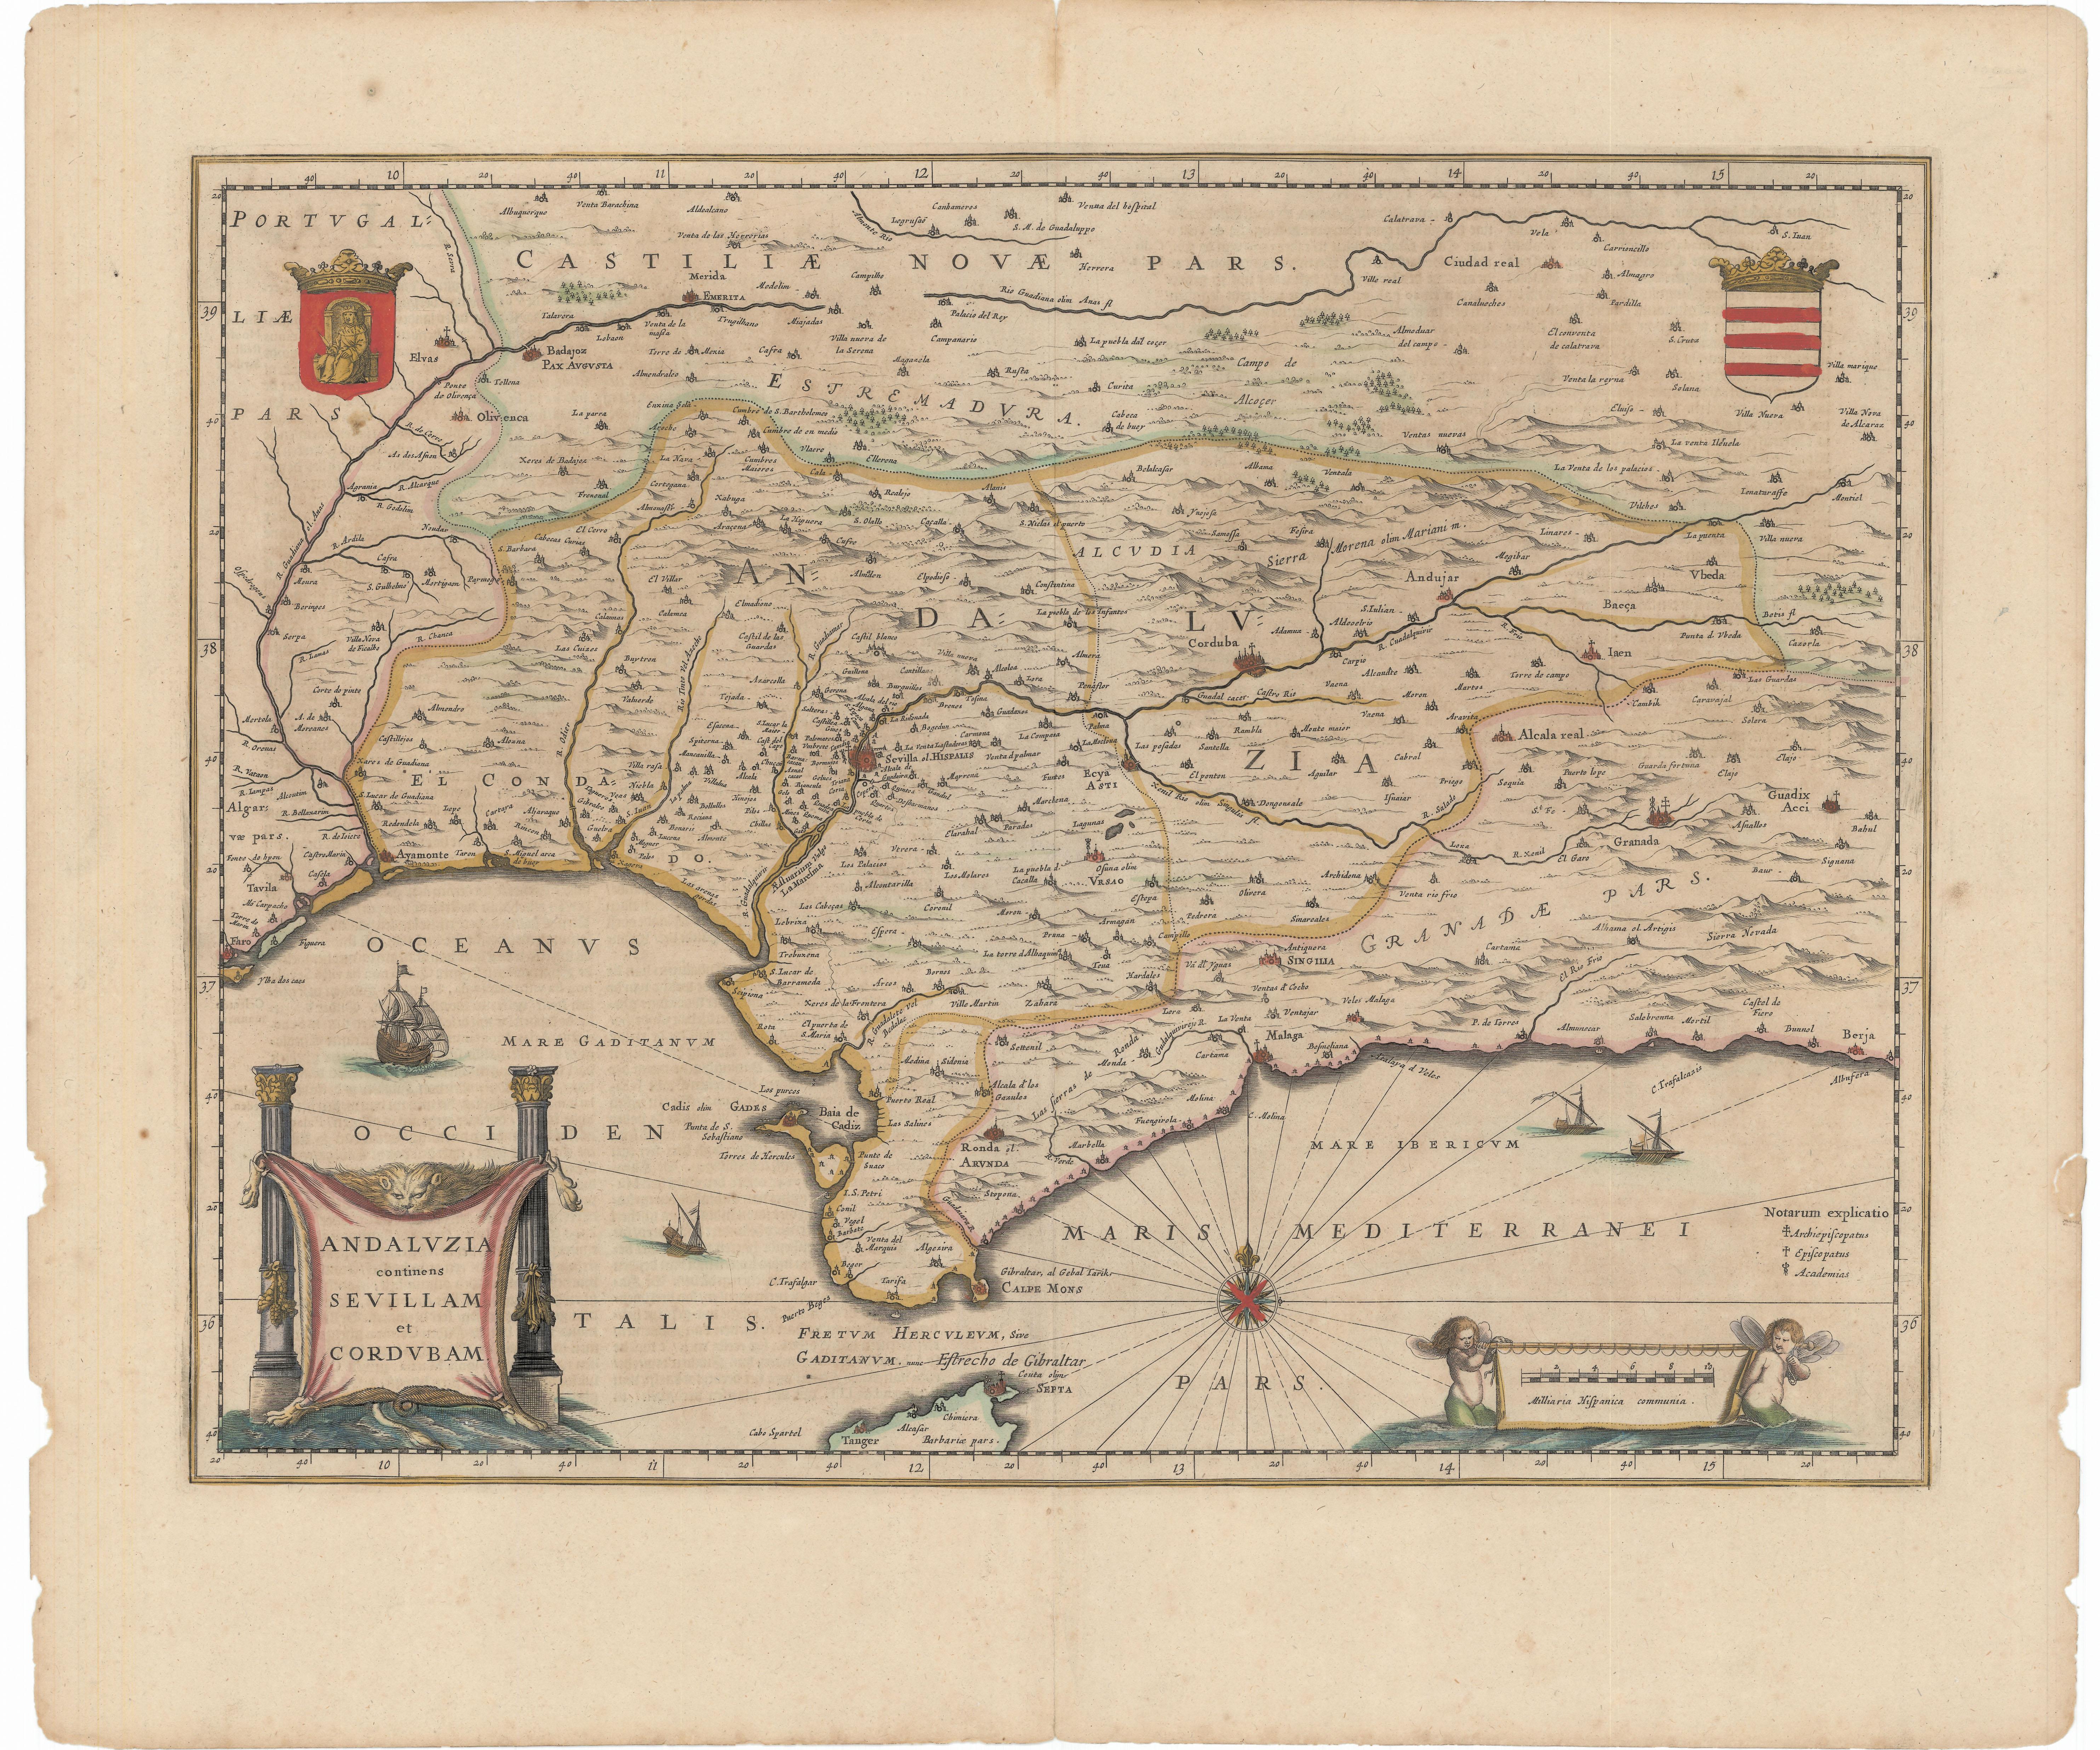 http://www.ign.es/fondoscartograficos/Cartografias_G/0164_32-D-76_1.jpg